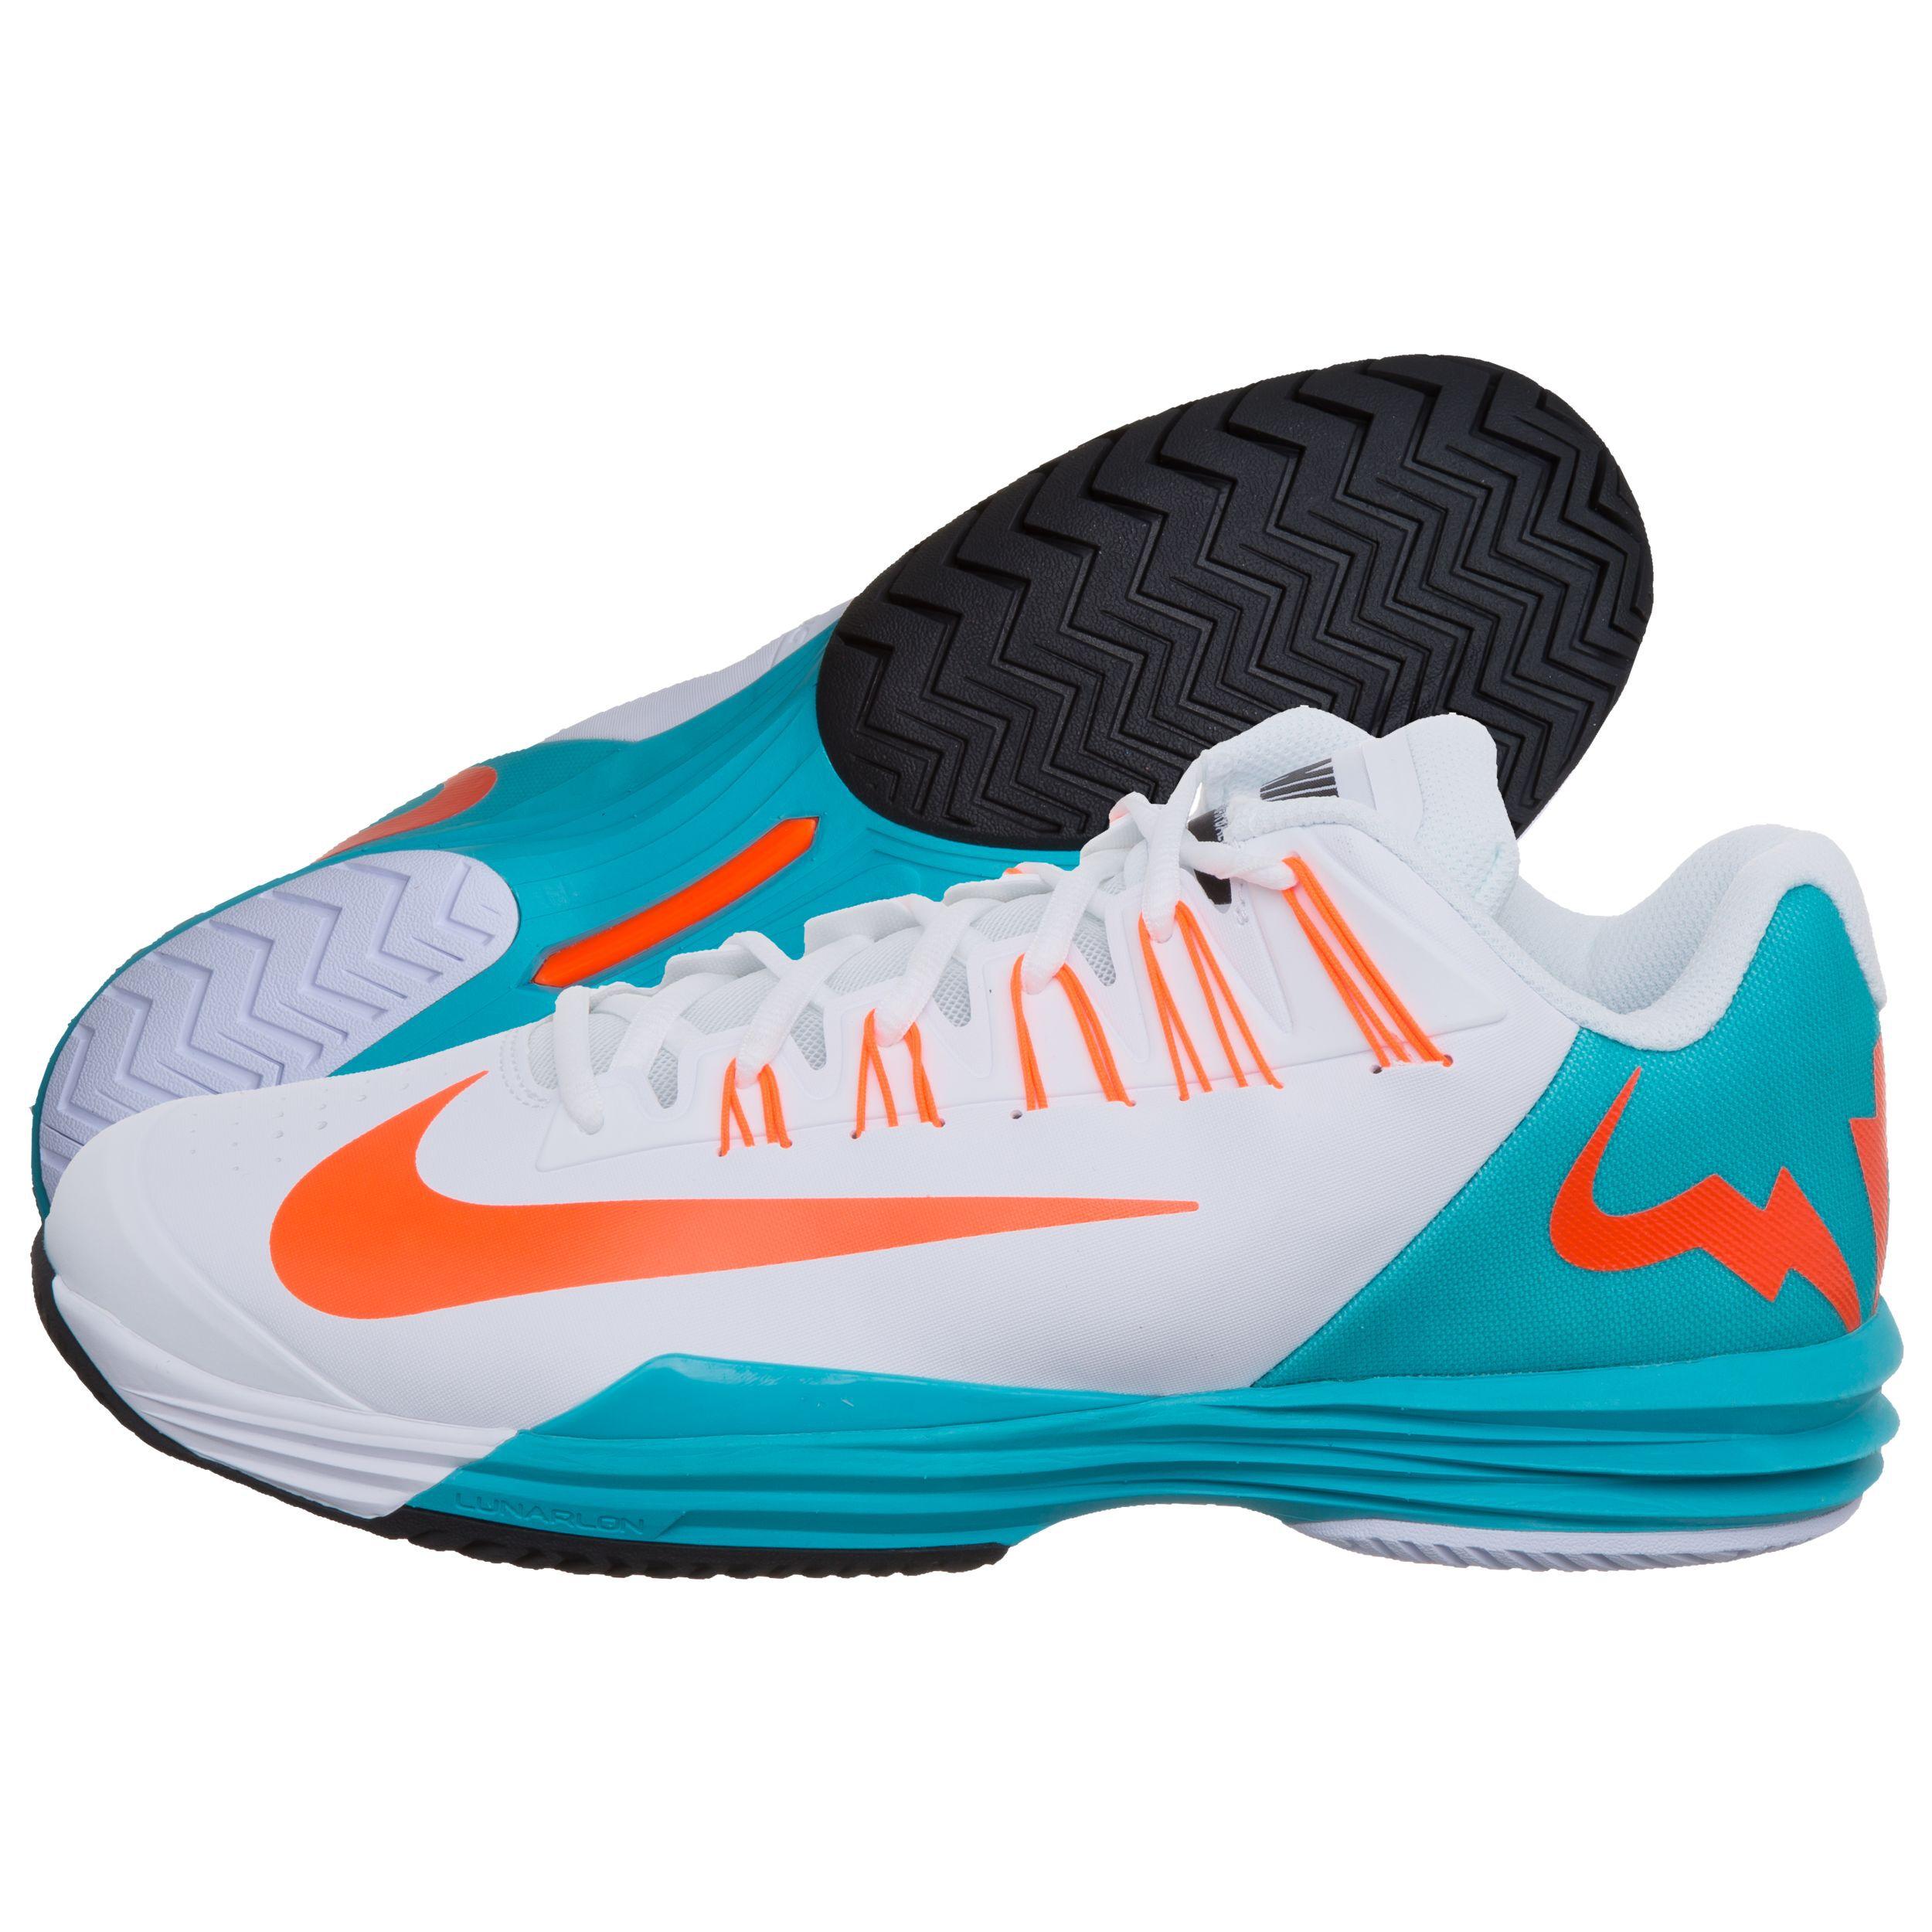 Nike Rafael Nadal Lunar Ballistec Chaussures Toutes Surfaces